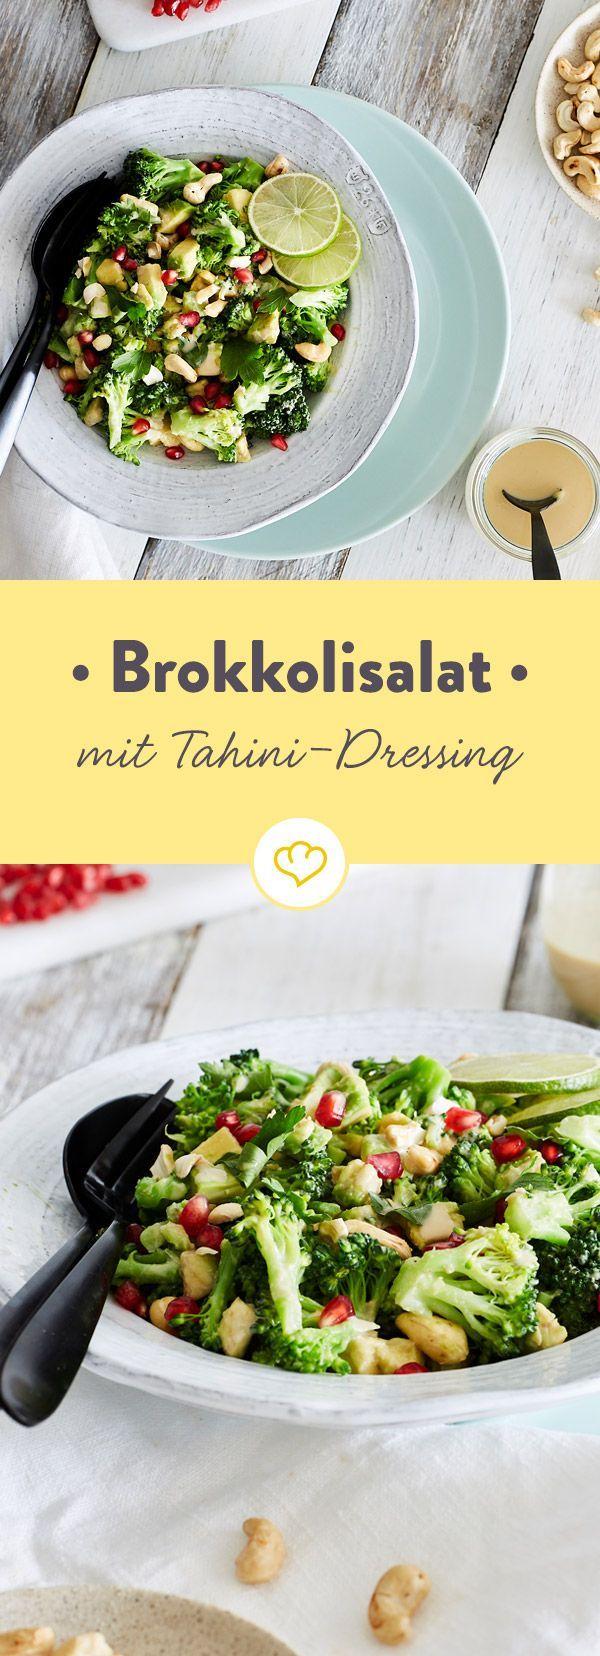 Veganer Brokkolisalat mit Tahini-Dressing   - Rezepte für Kinder mit Gemüse -